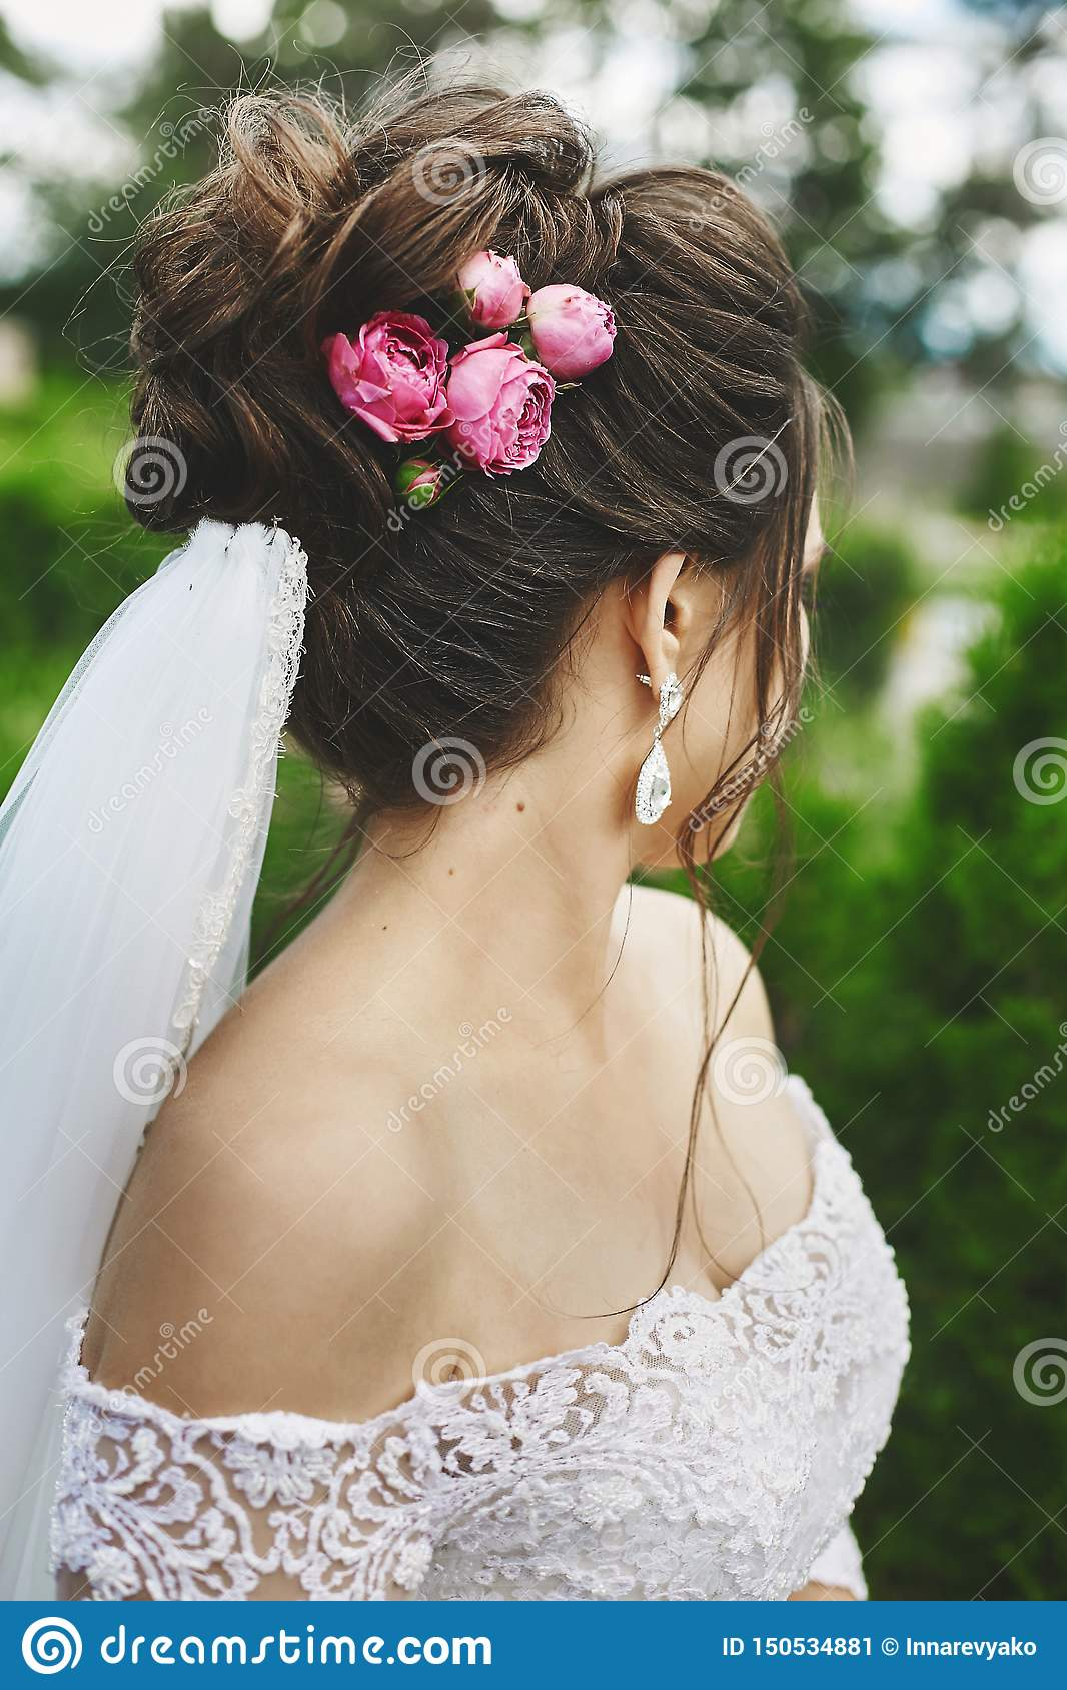 Beautiful Plus Size Model Woman With Stylish Wedding Hairstyle